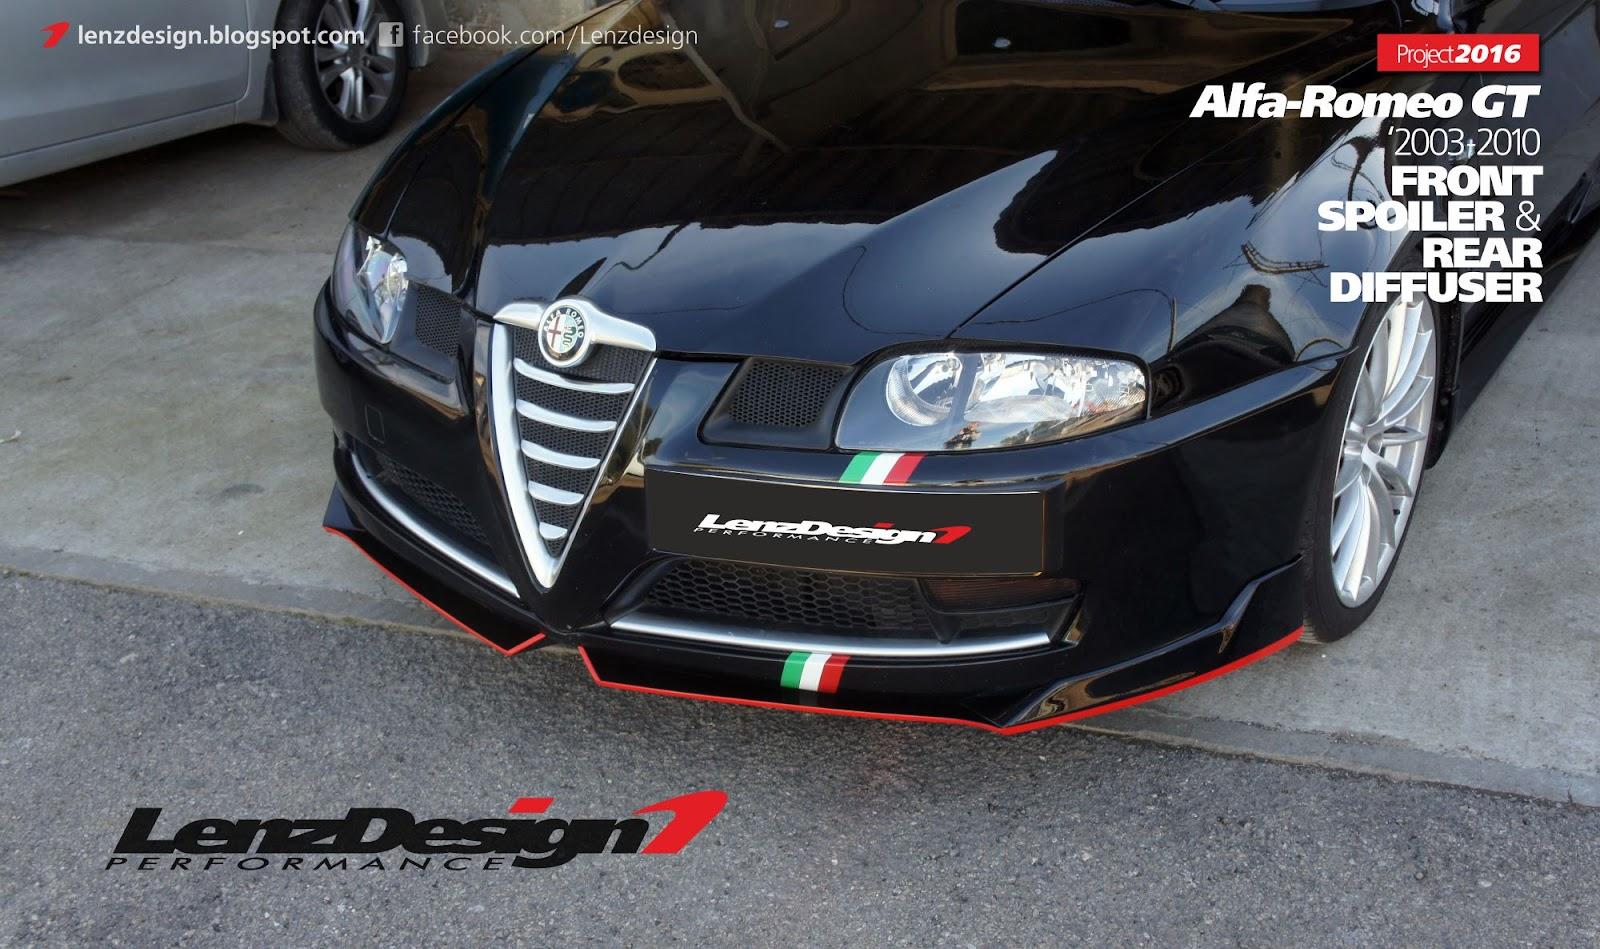 Alfa Romeo GT Body Kit Lenzdesign Performance